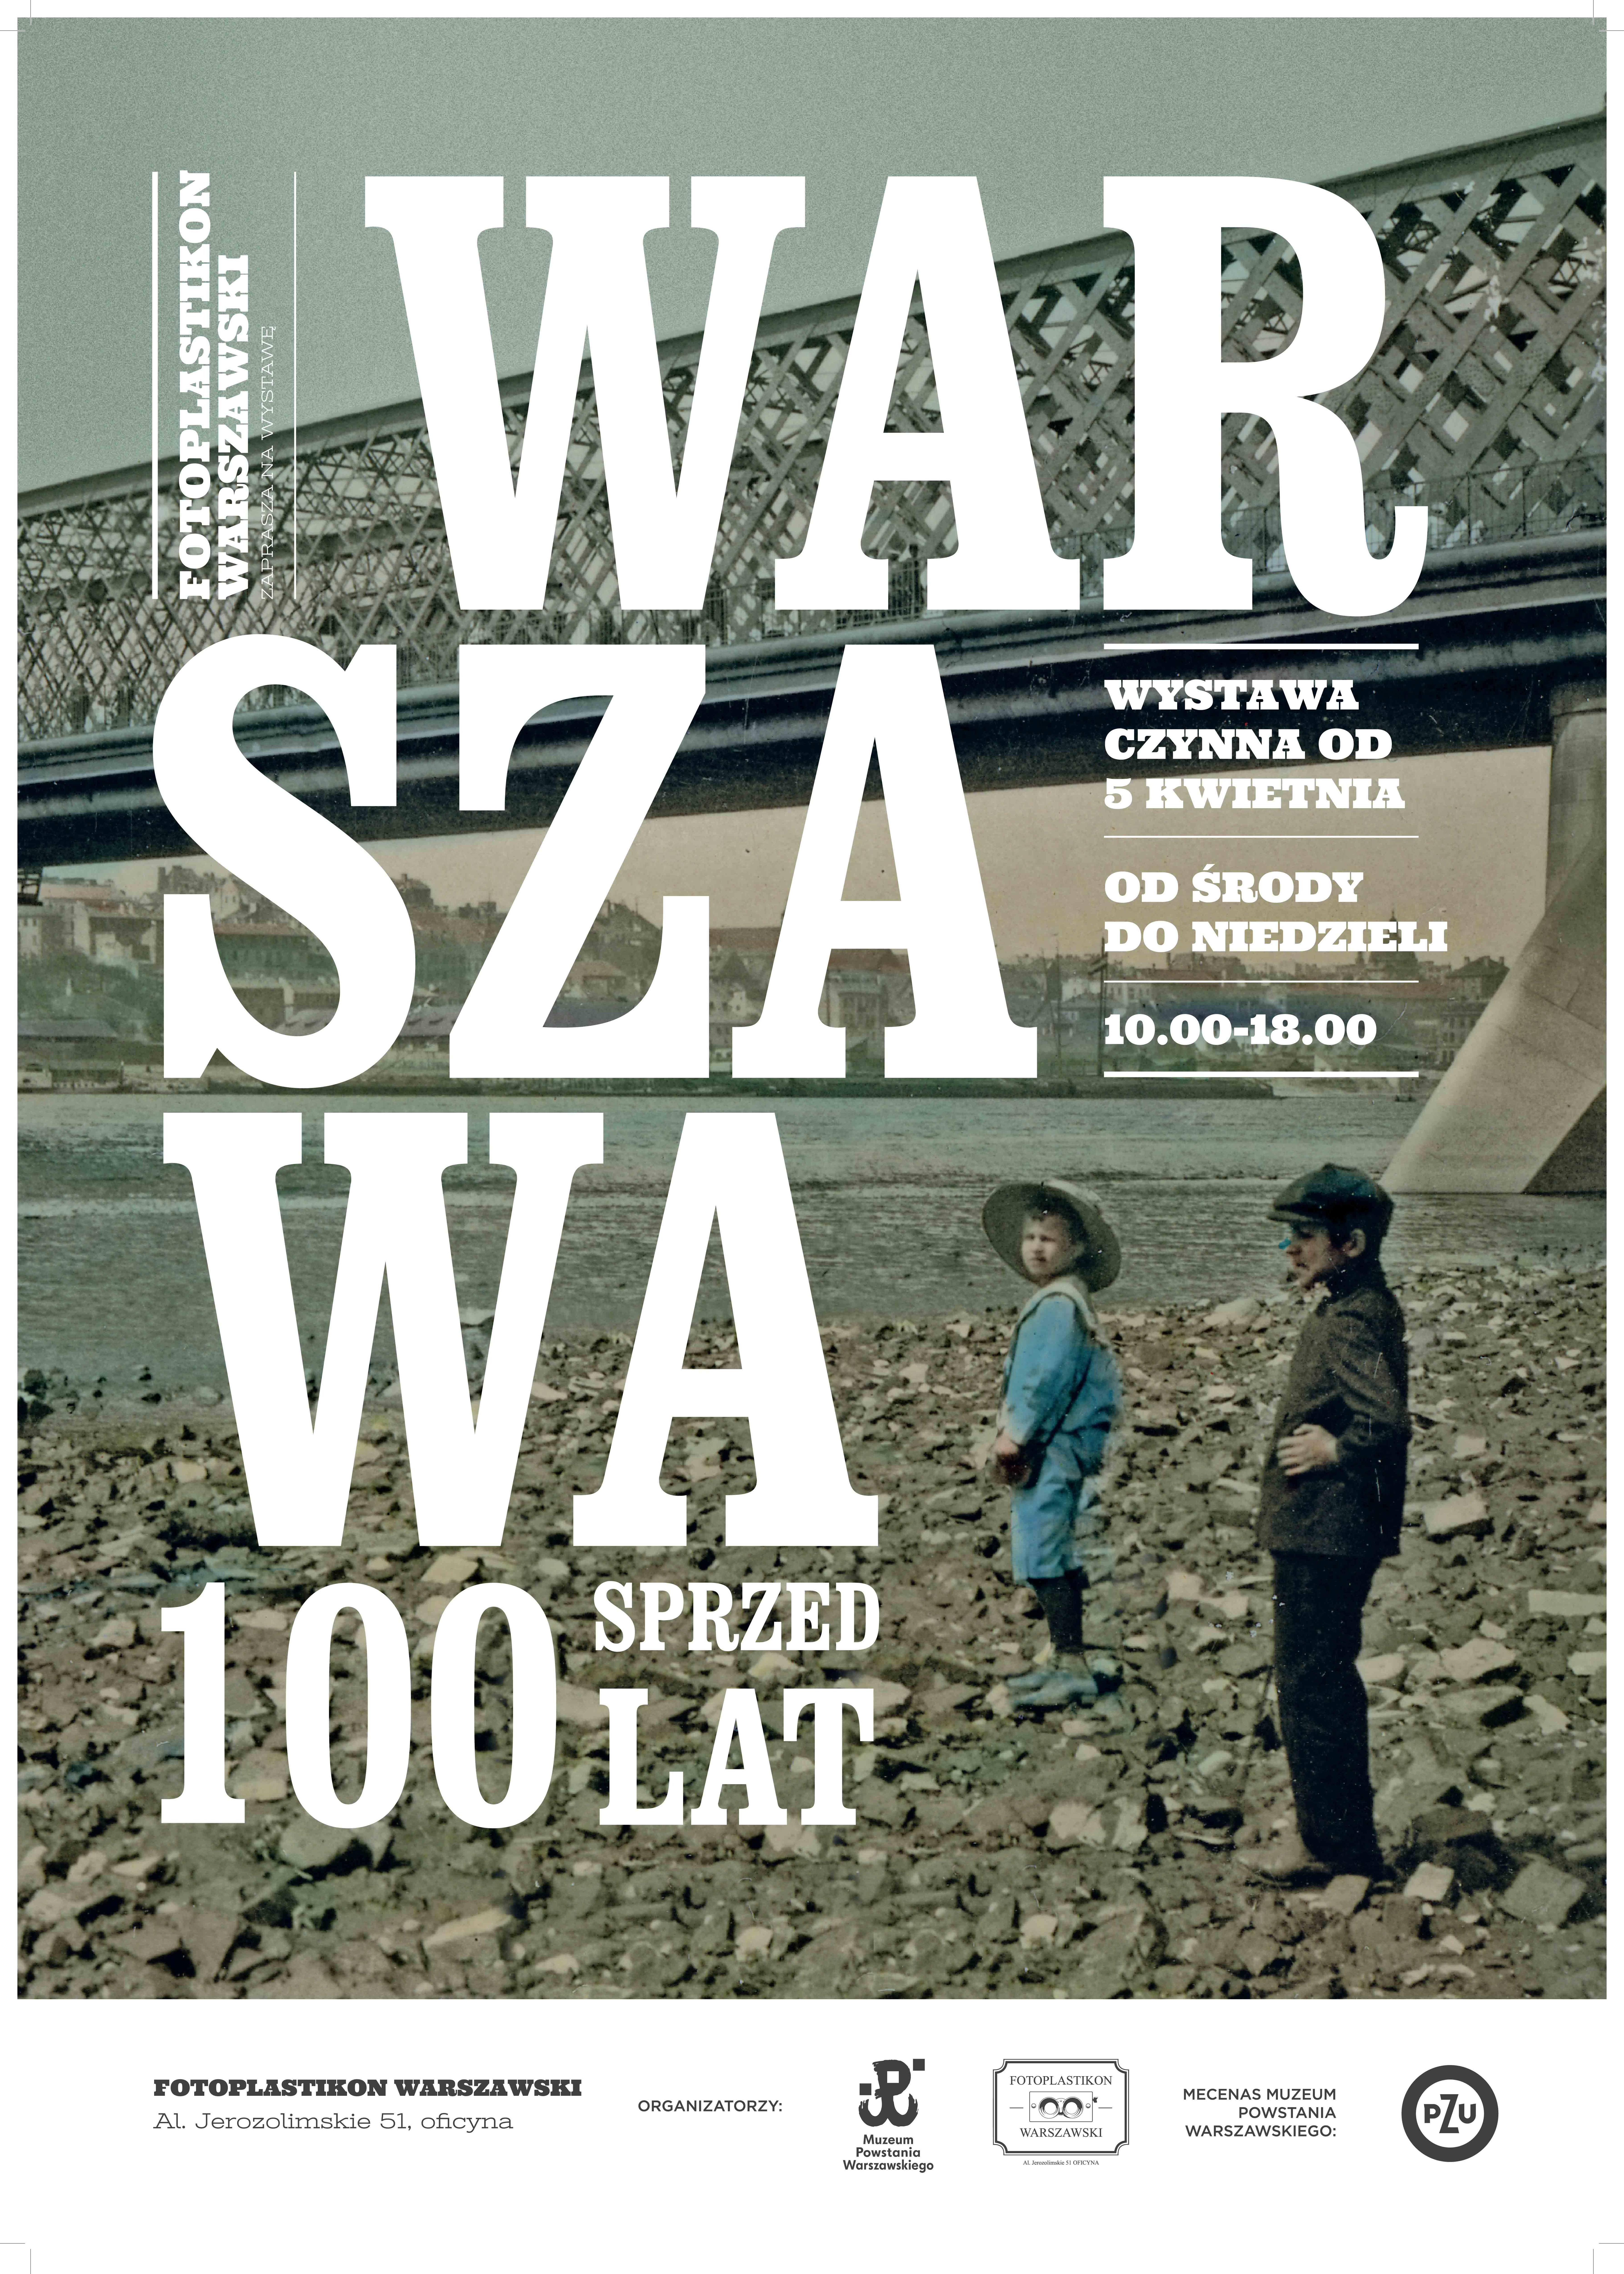 Fotoplastikon-Warszawa-sprzed-100-lat-2017-04